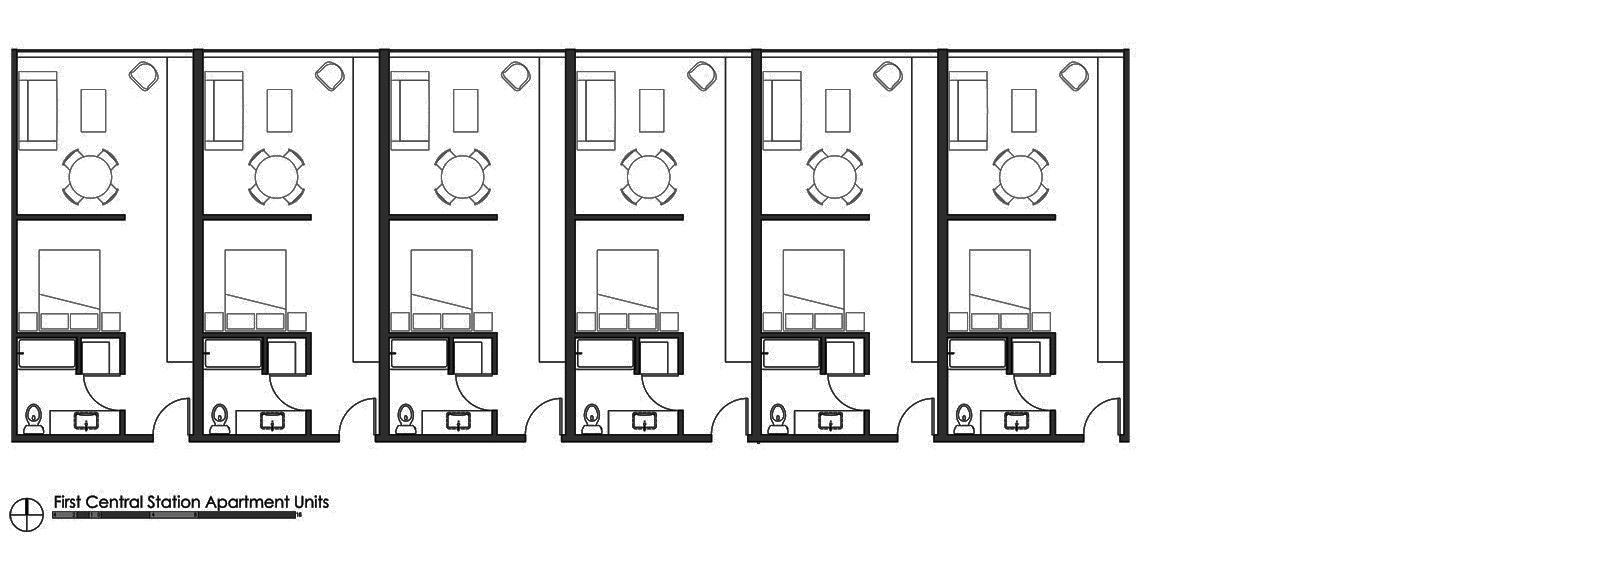 BUILD-LLC-First-Central-Station-Plan